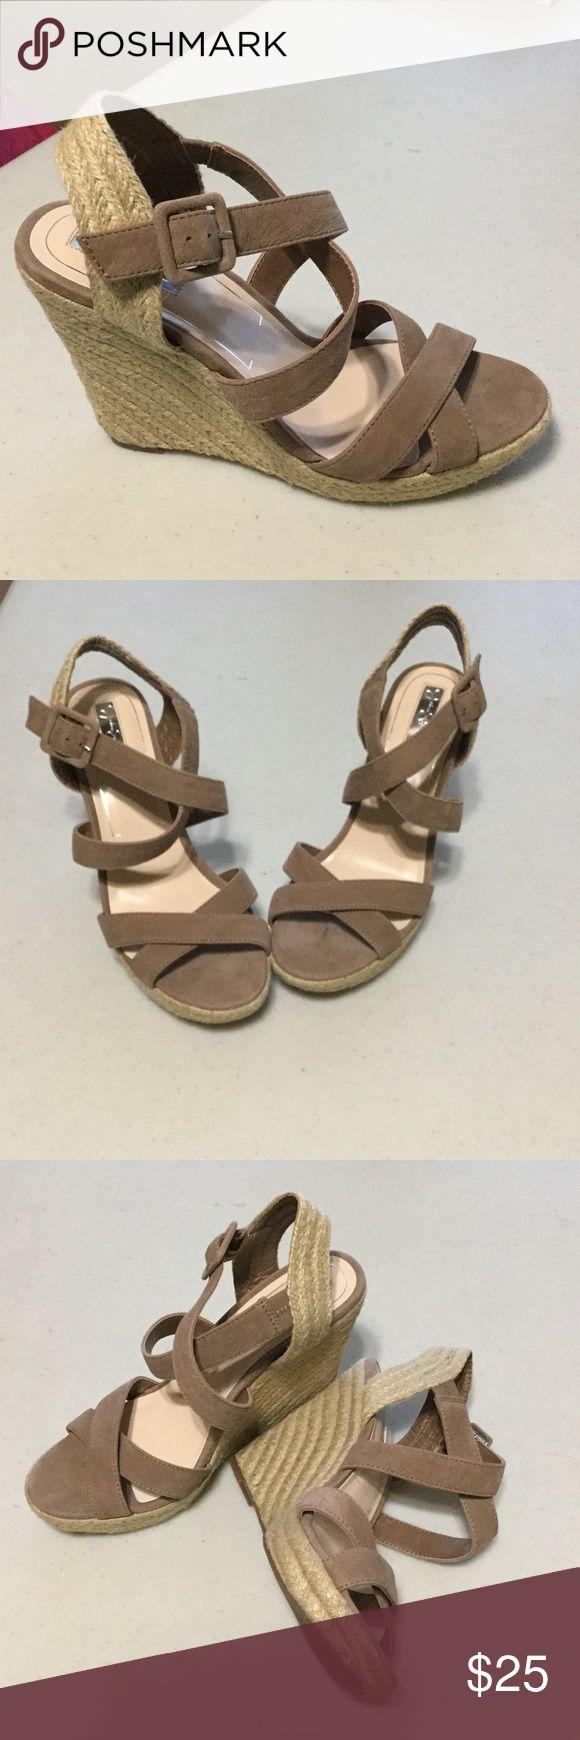 Jessica Simpson Wedge Shoes Jessica Simpson Size 9 Like New Jessica Simpson Shoes Wedges